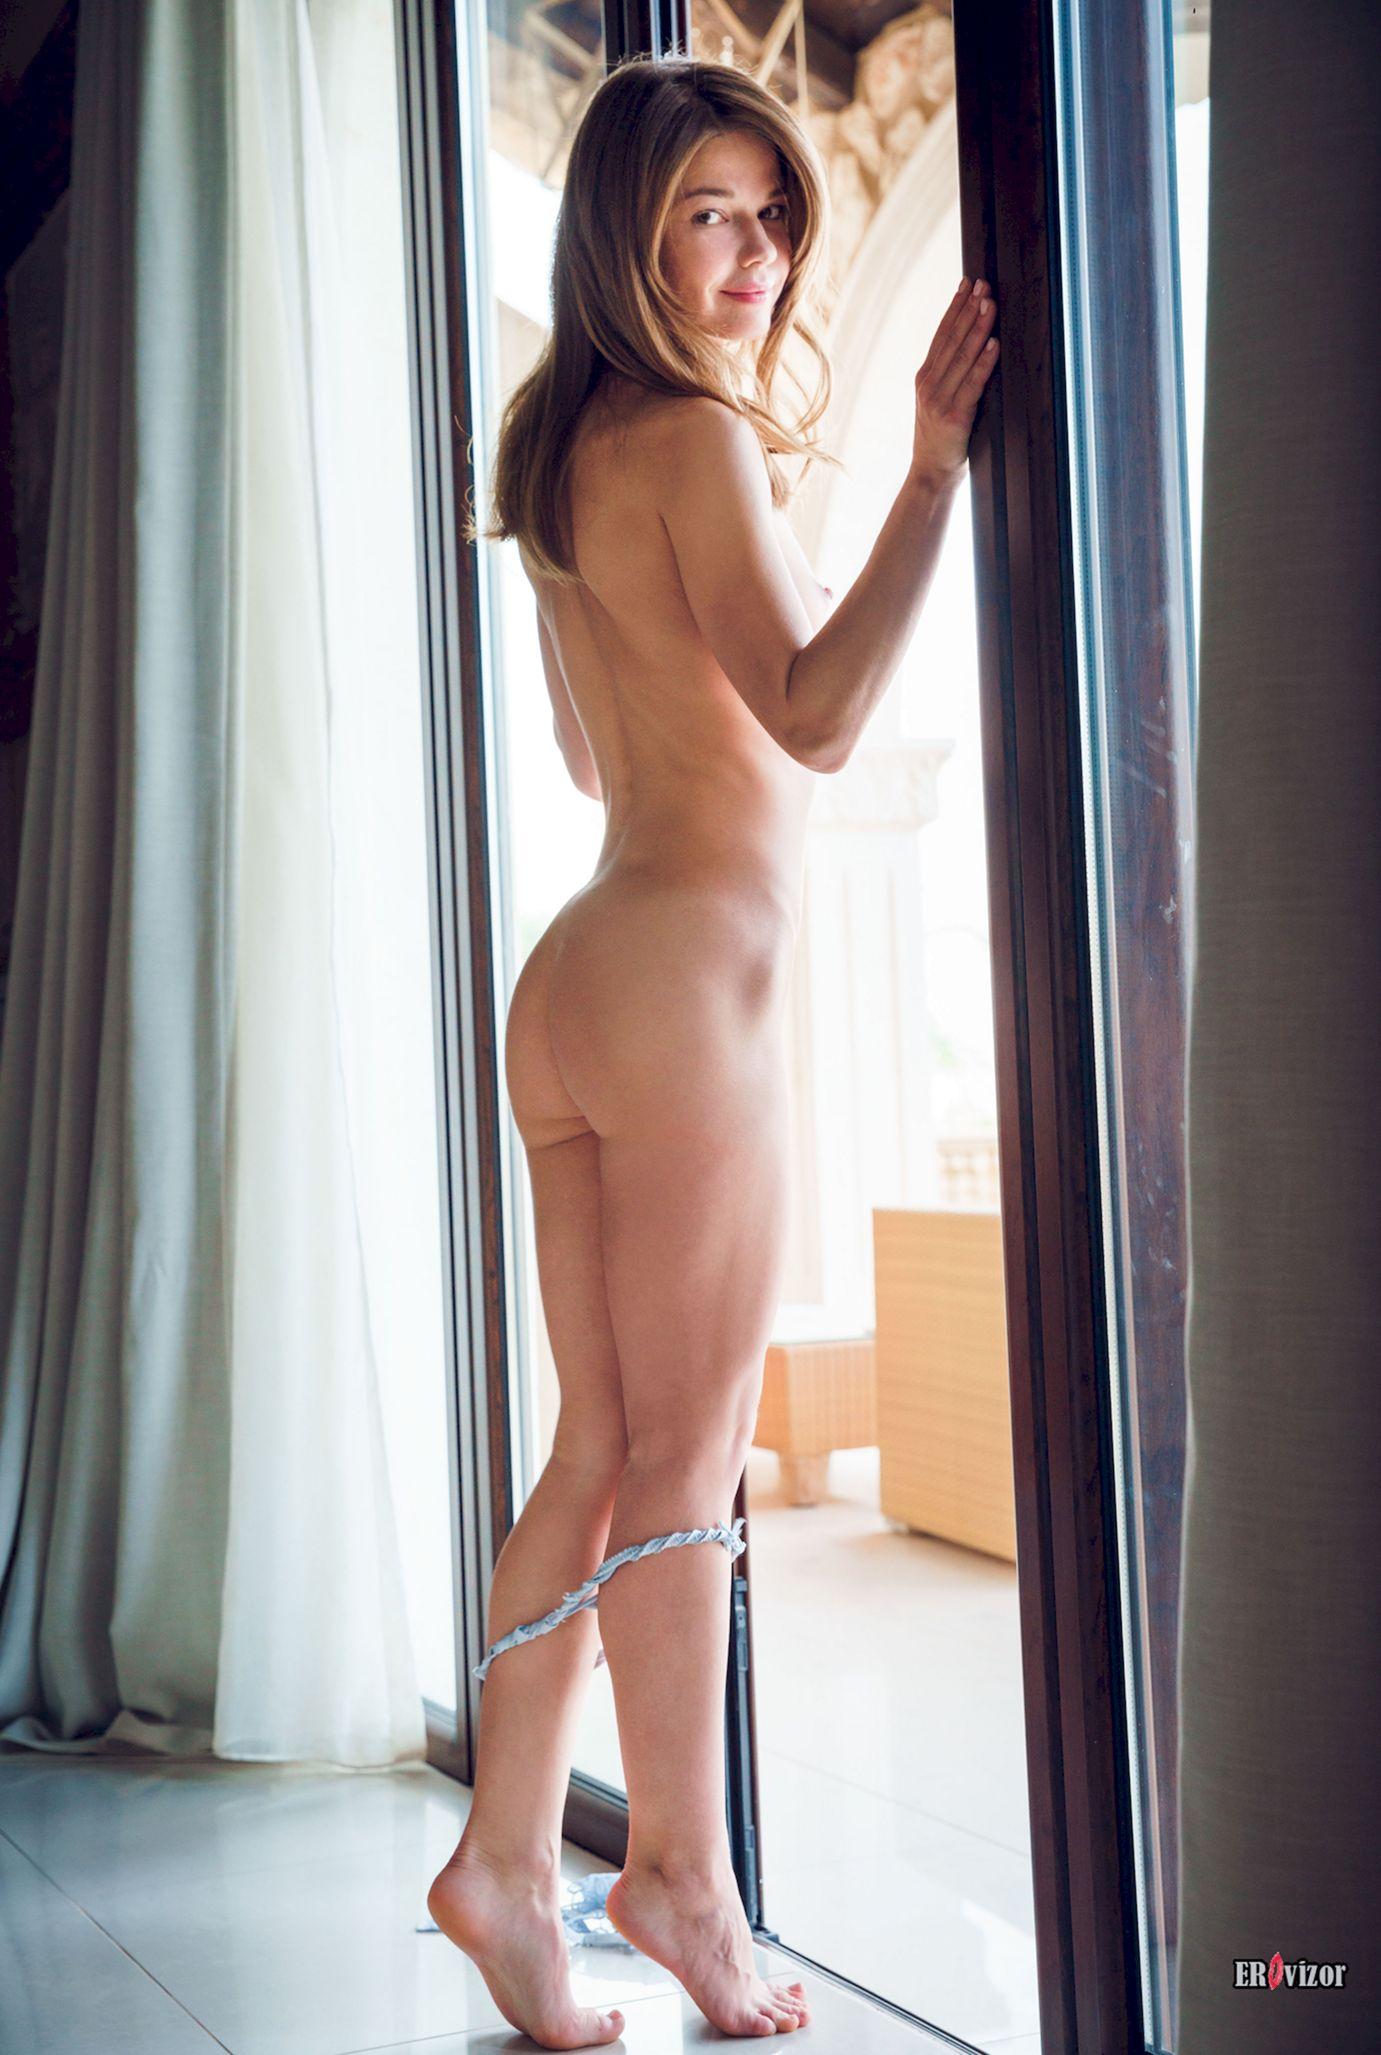 Jacqueline-erotic-set (2)